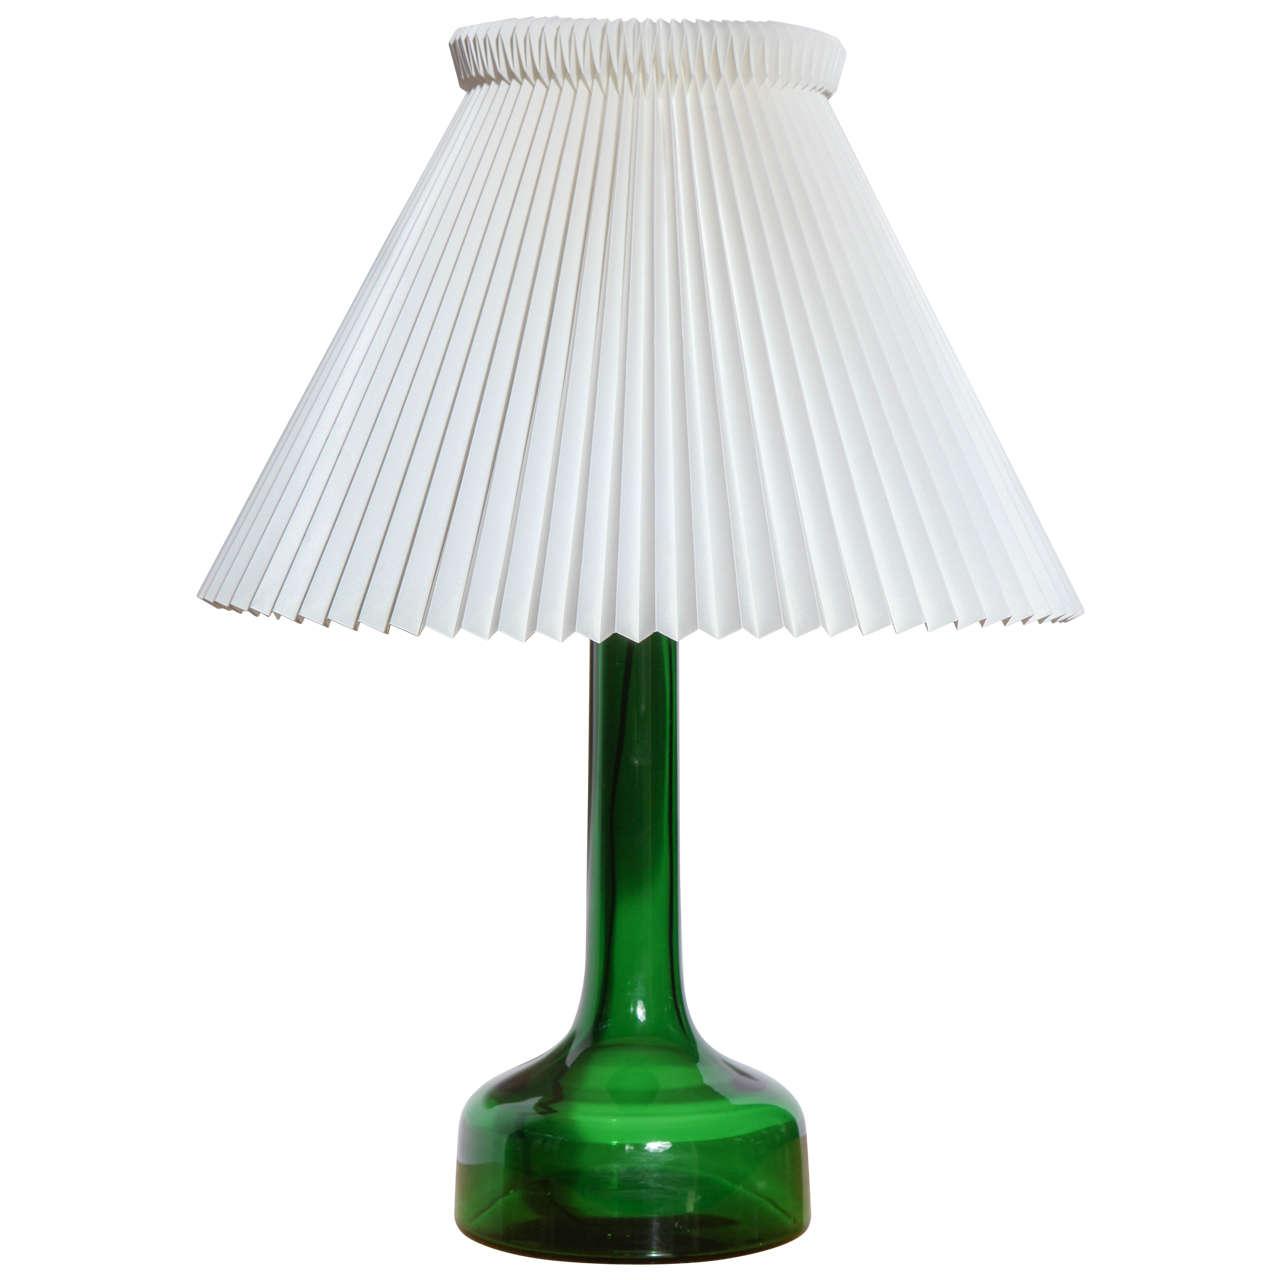 le klint lighting. vintage 343 table lamp by gunnar biilmann-petersen, mfg. le klint for sale lighting